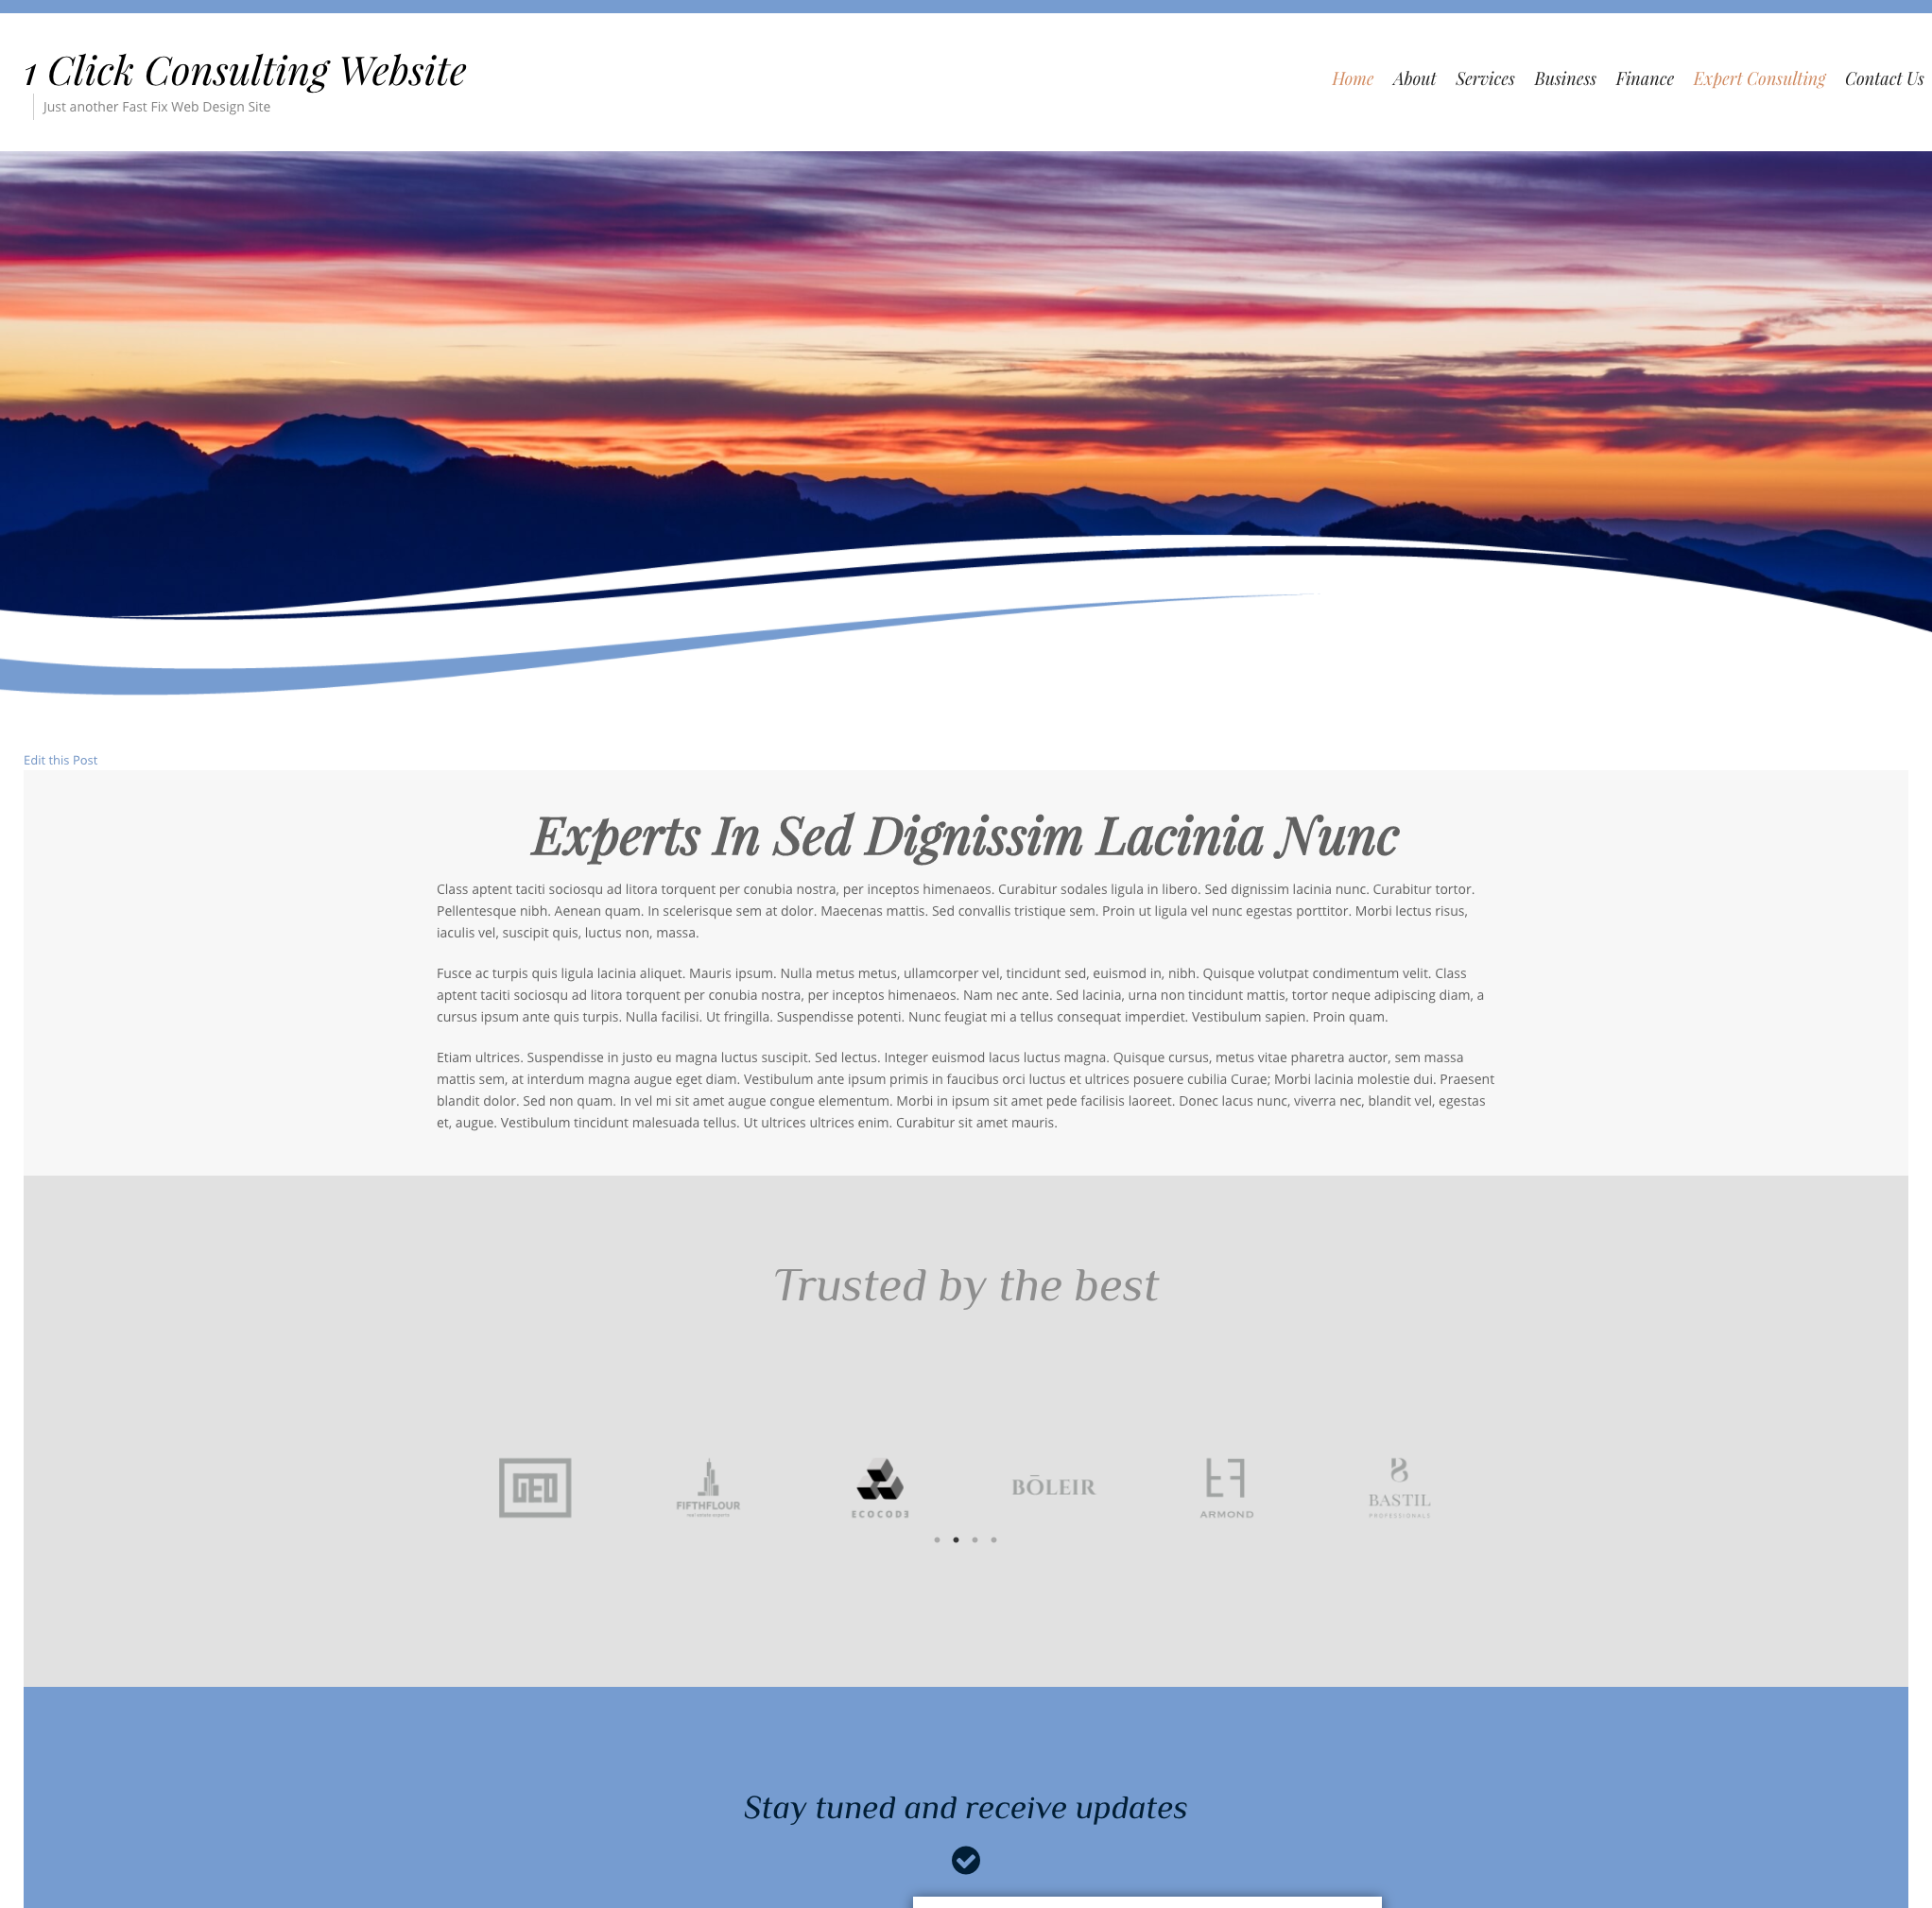 Elementor Consulting Website 1 Click Installation